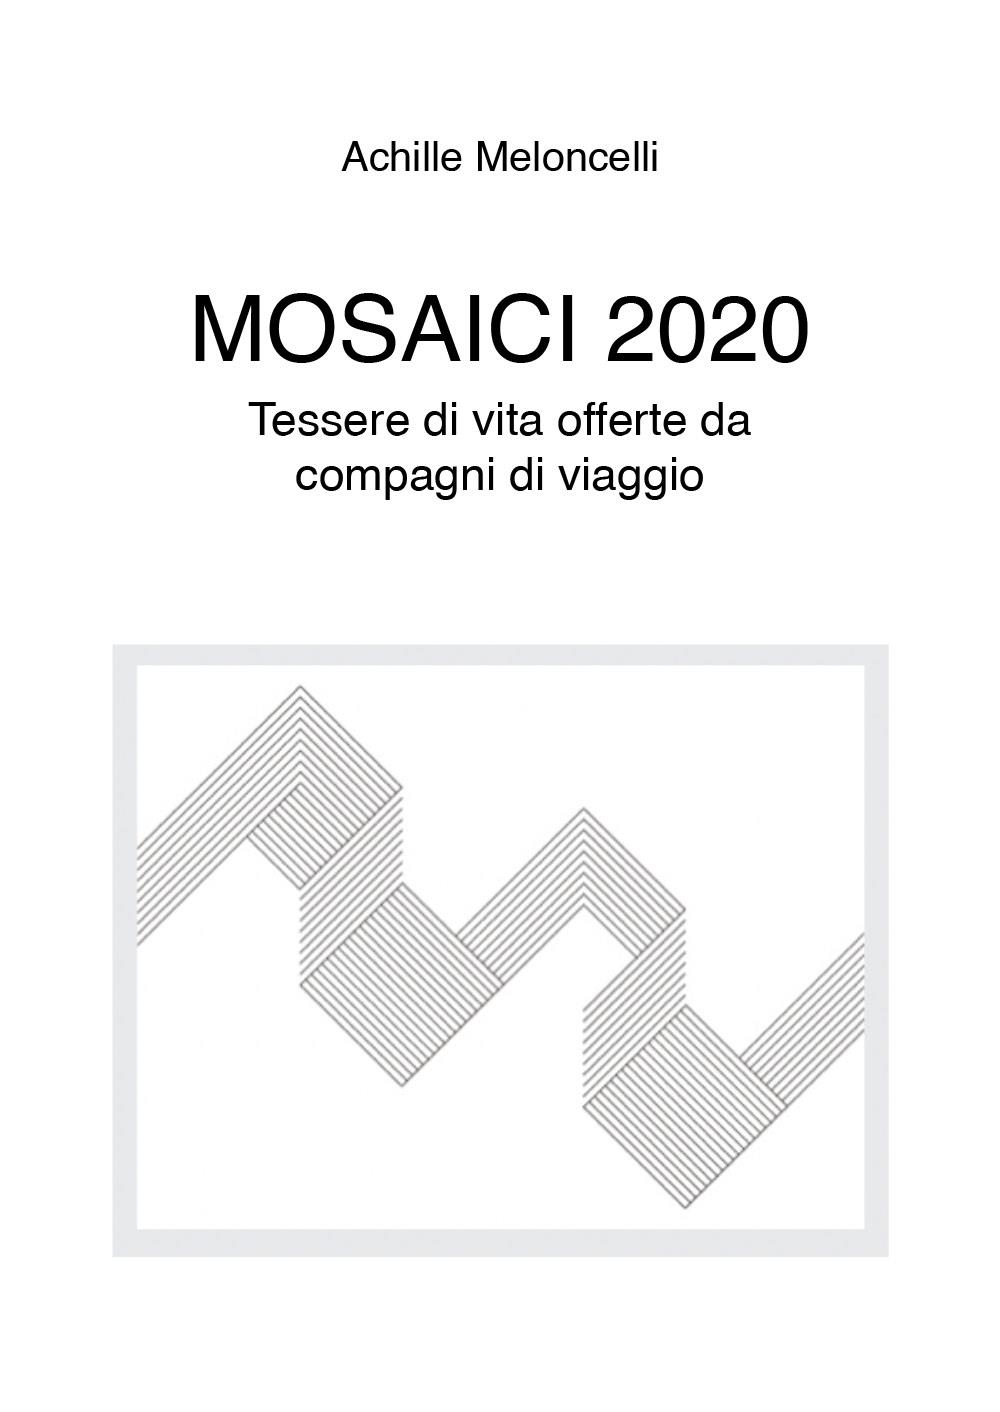 Mosaici 2020